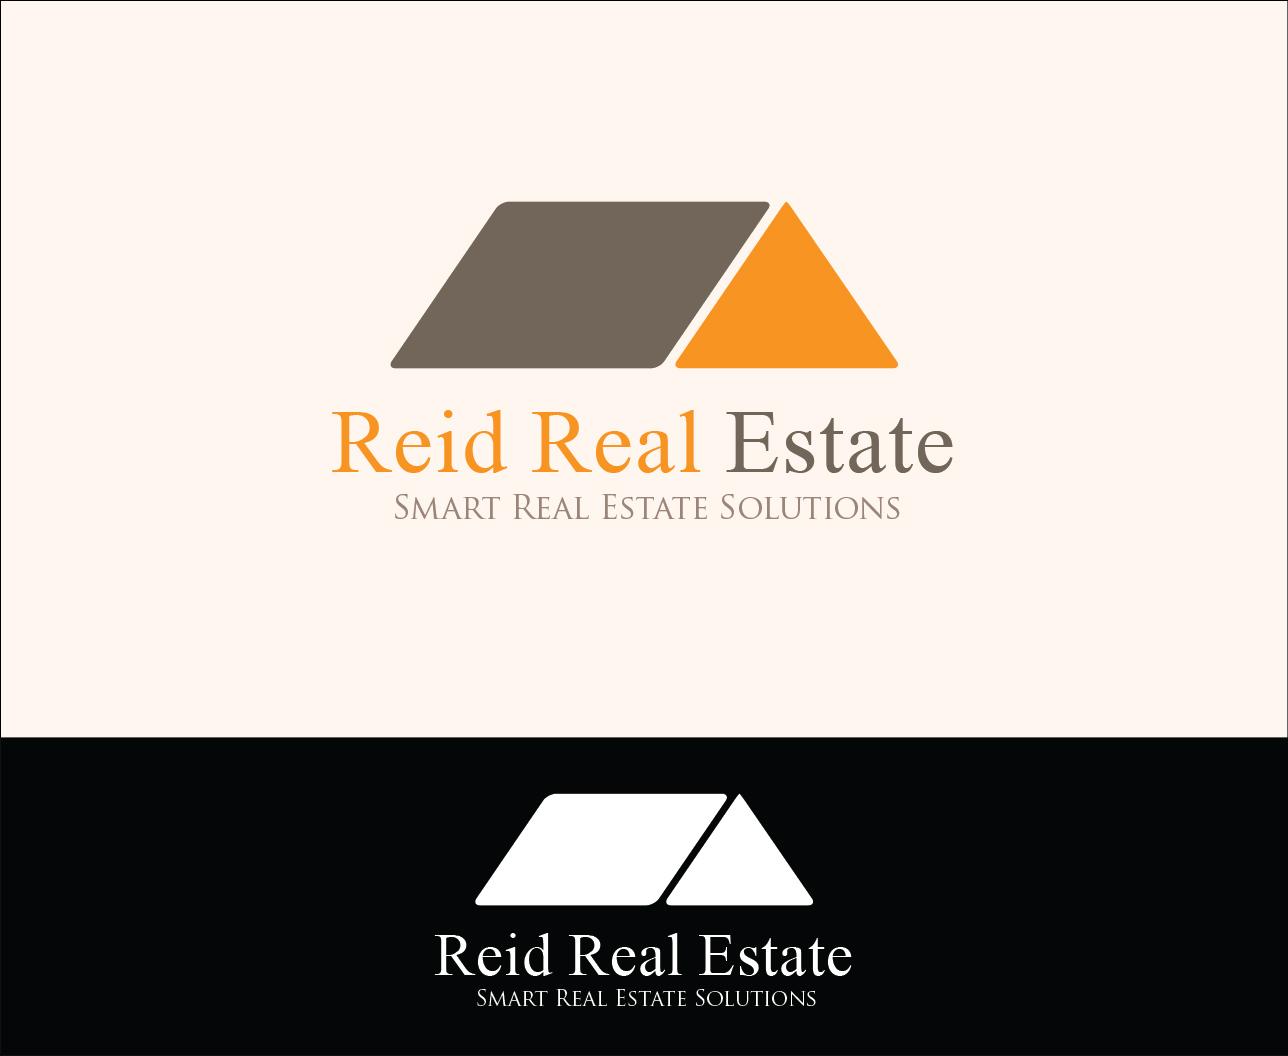 Logo Design by Derel Valarian - Entry No. 5 in the Logo Design Contest Artistic Logo Design for Hadden Properties.